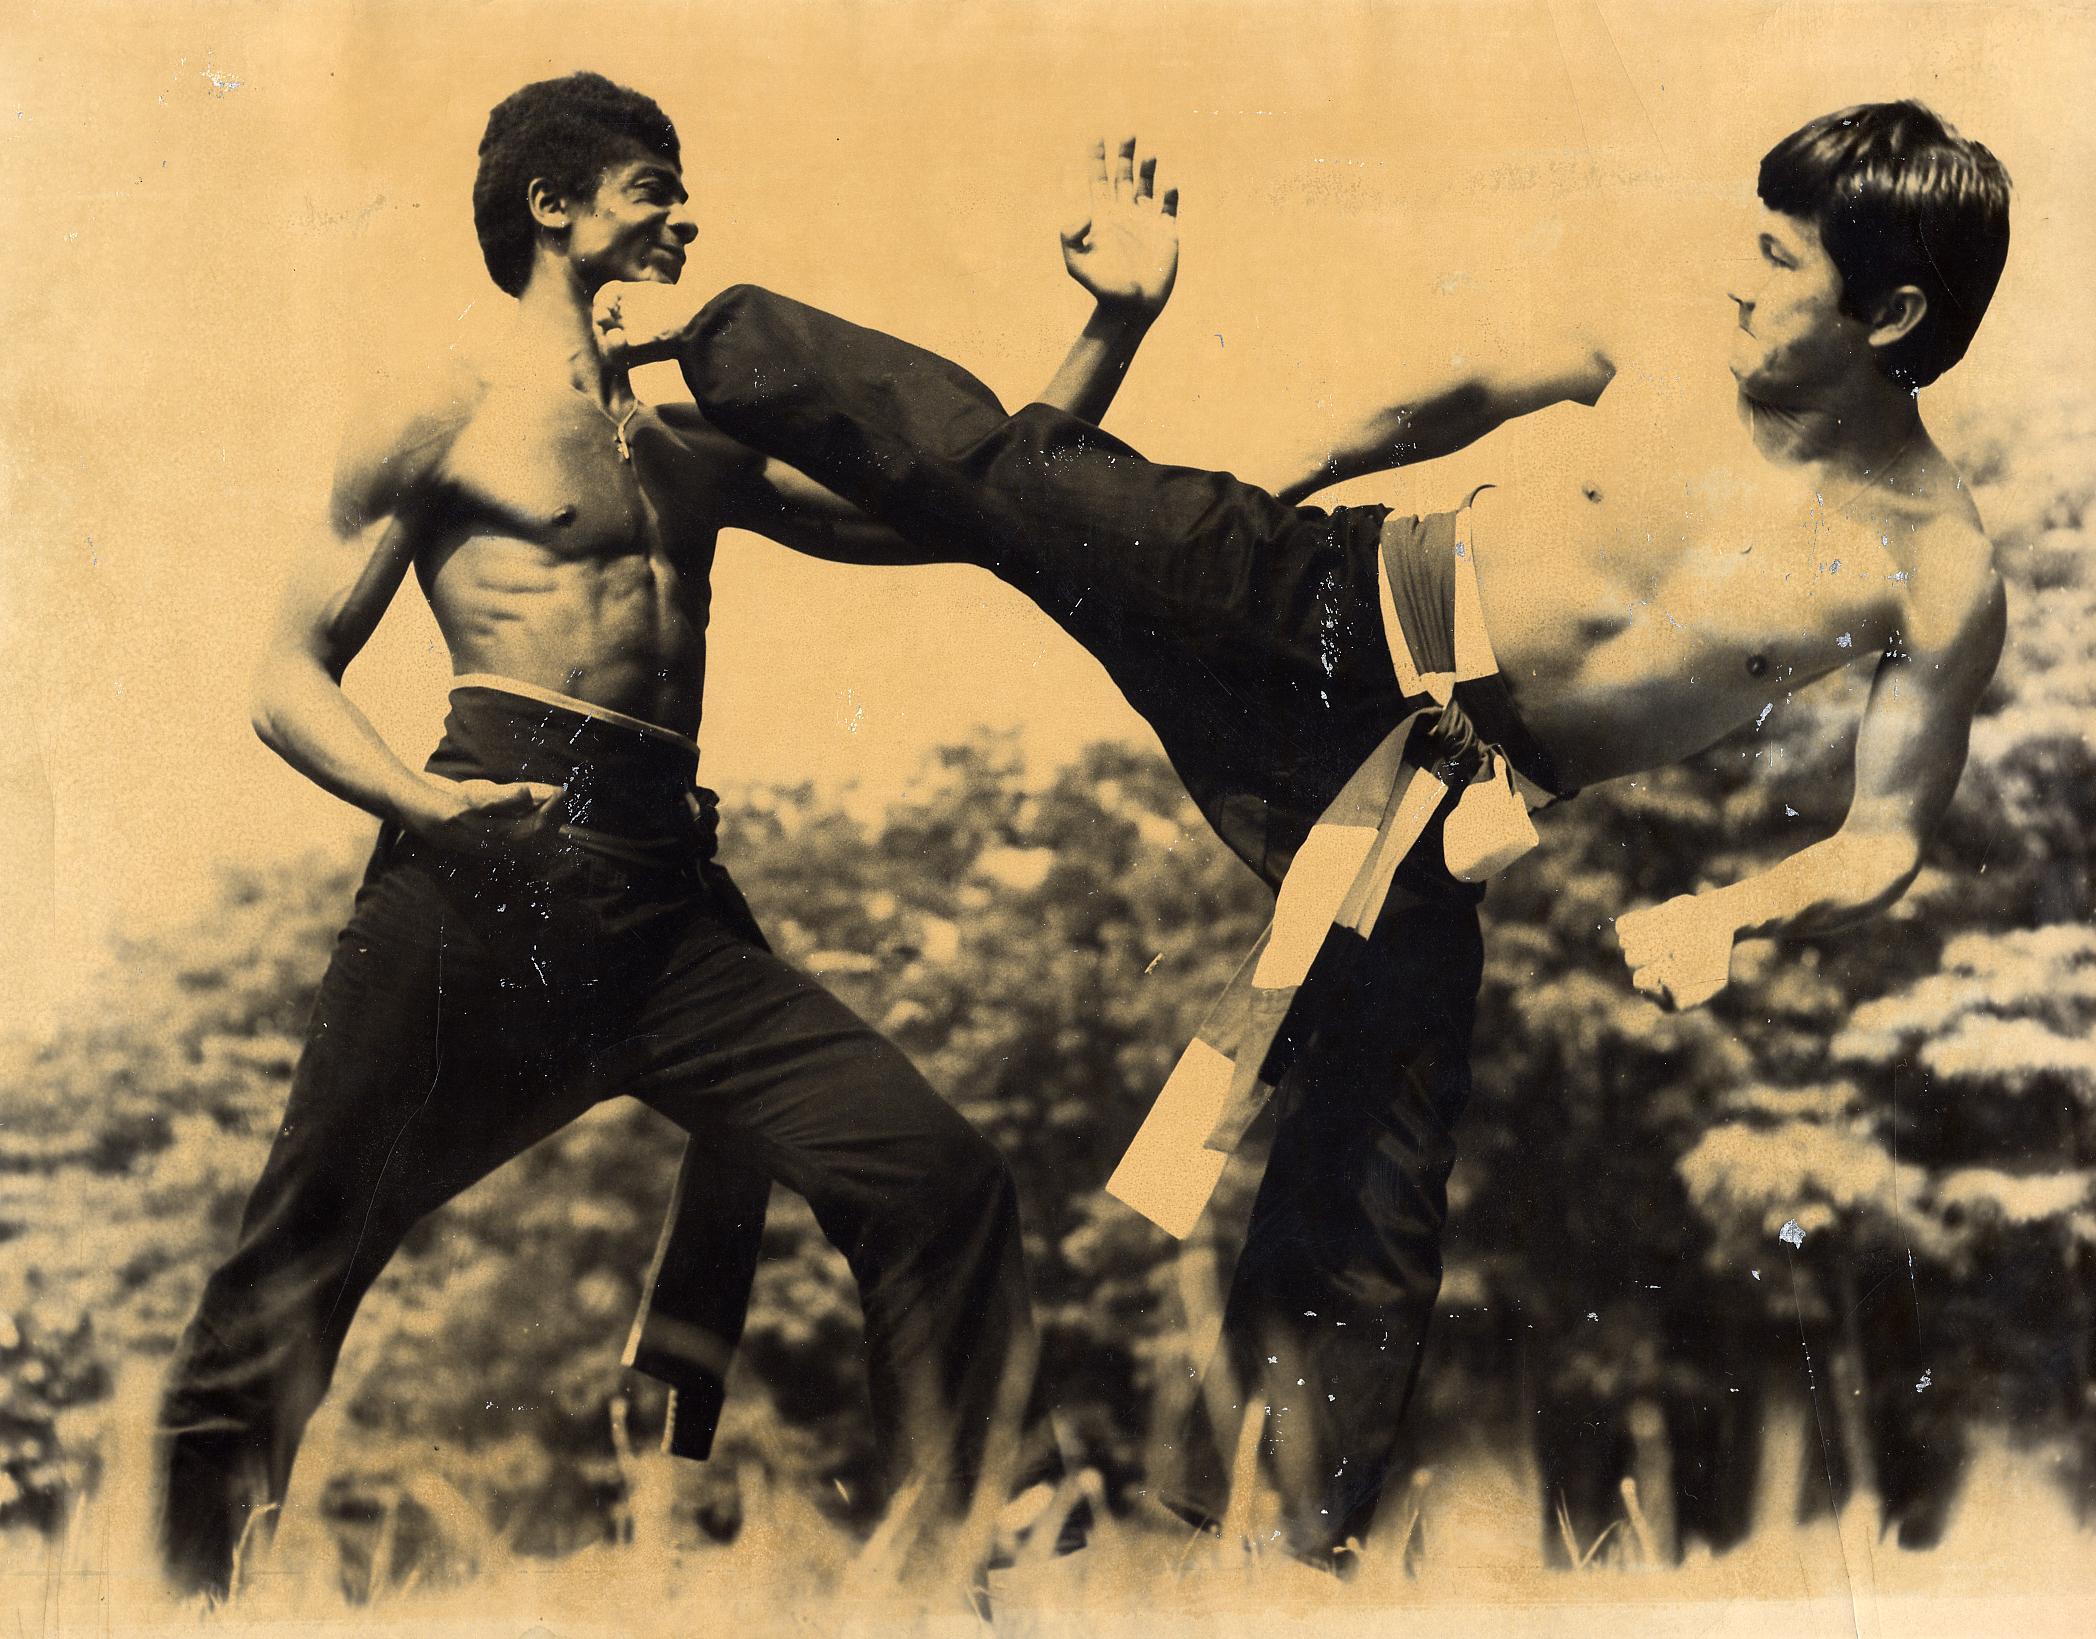 Le vietvodao viet vo dao chaville for Origine des arts martiaux